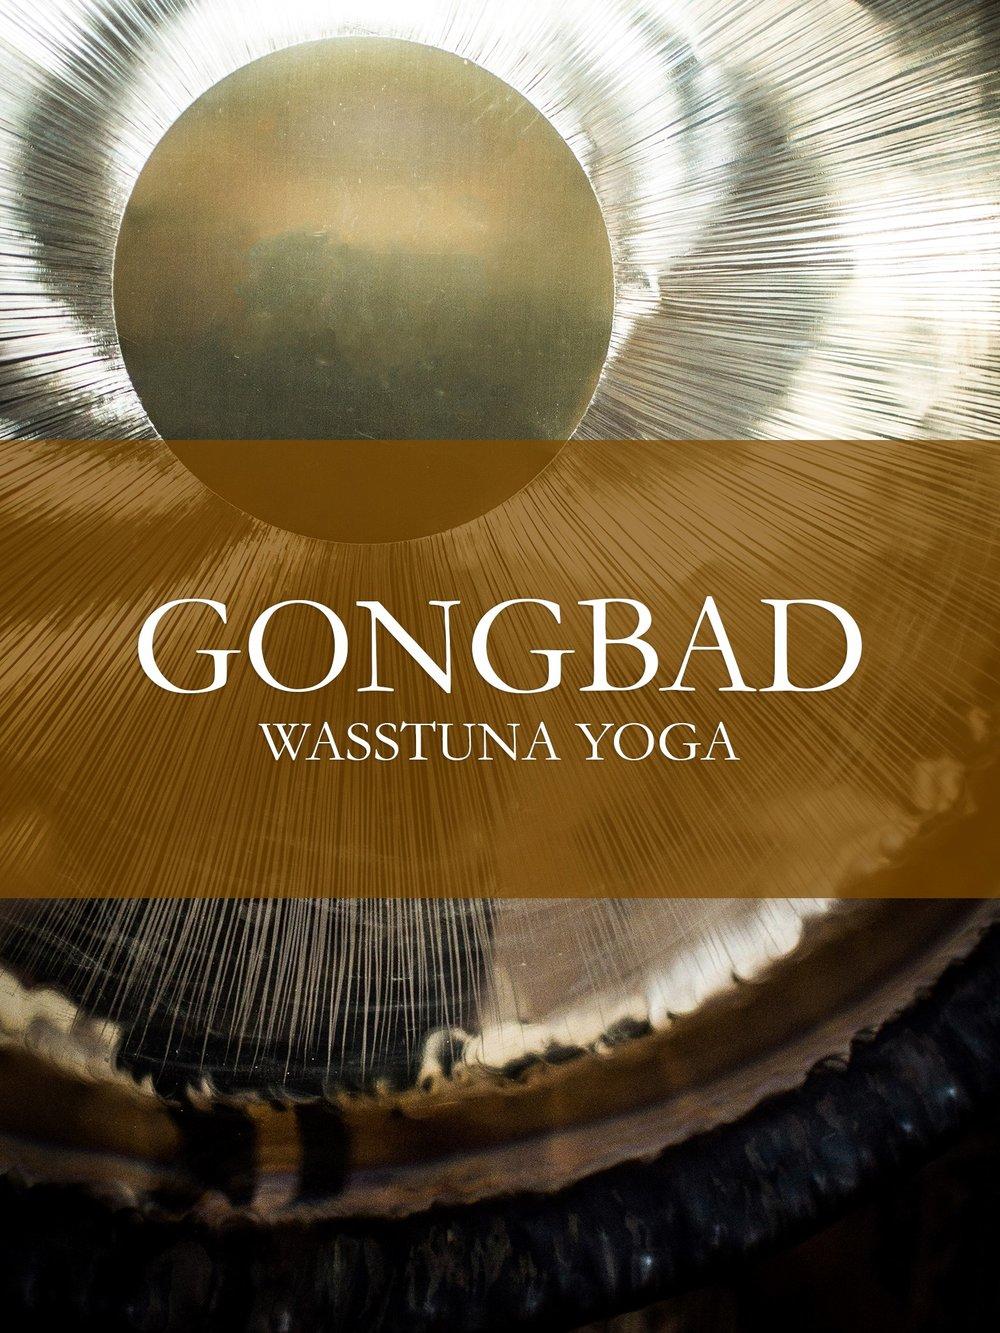 Gongbad 1.jpg